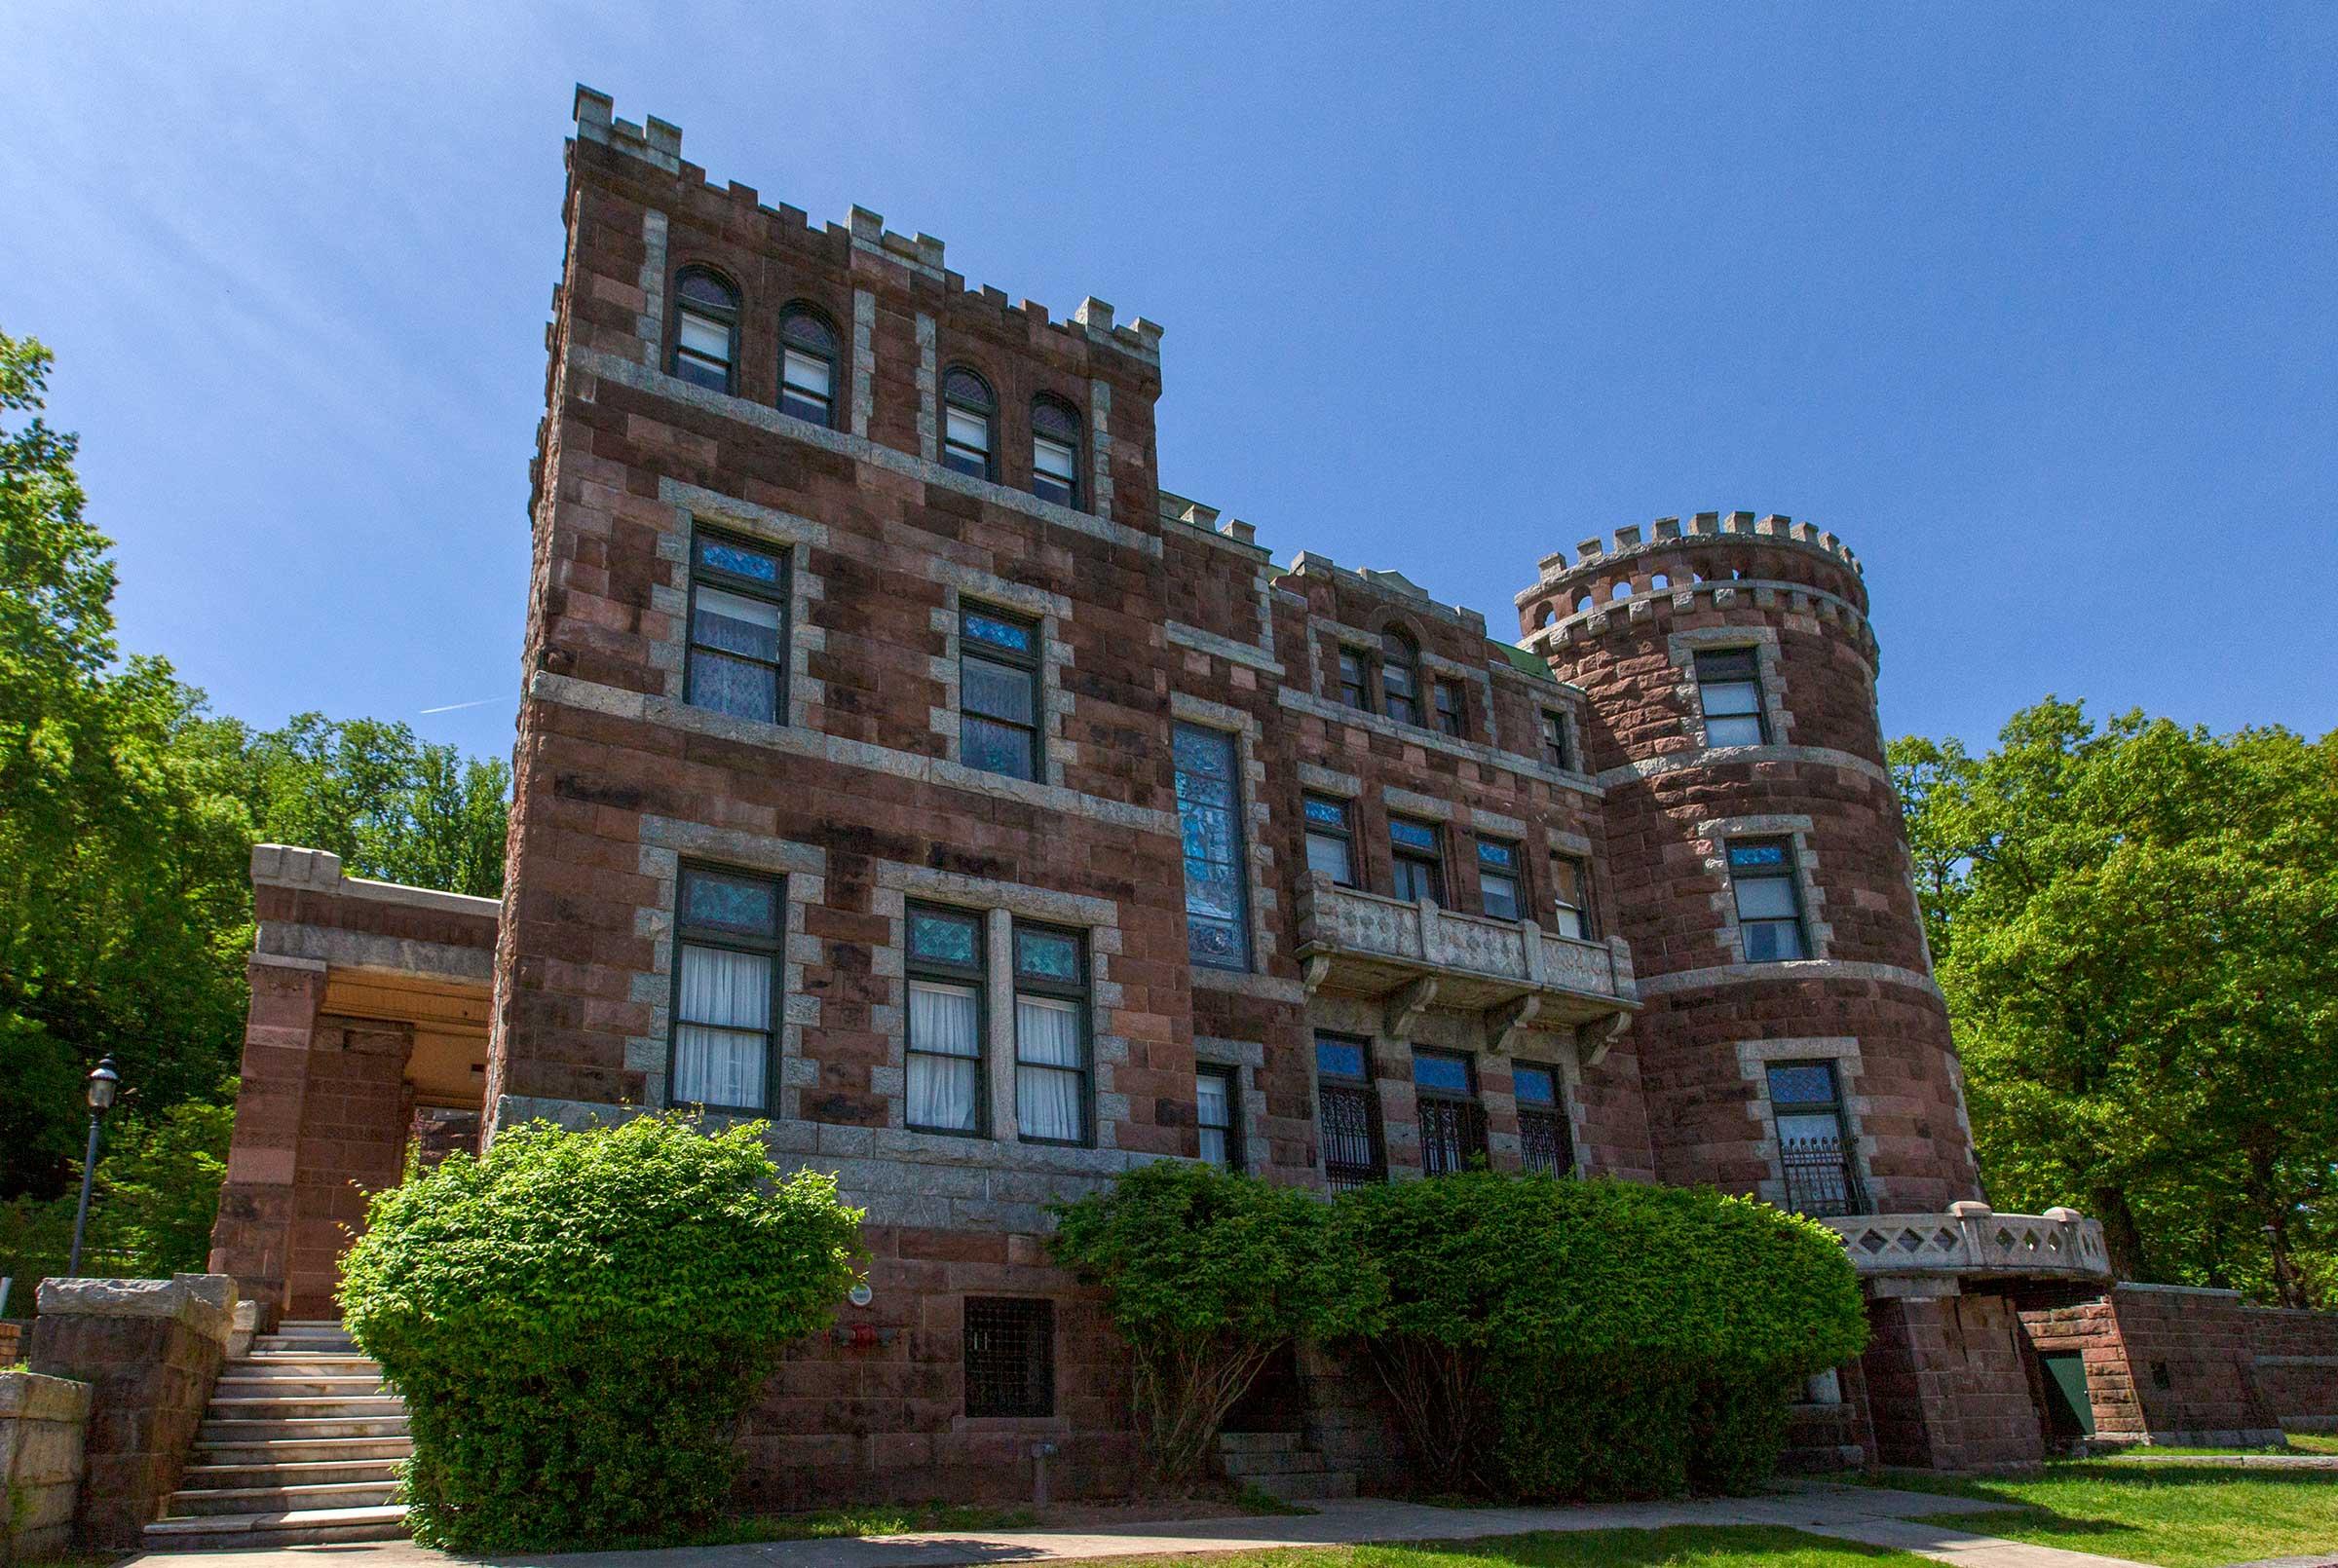 passaic-county_lambert-castle-paterson_slide